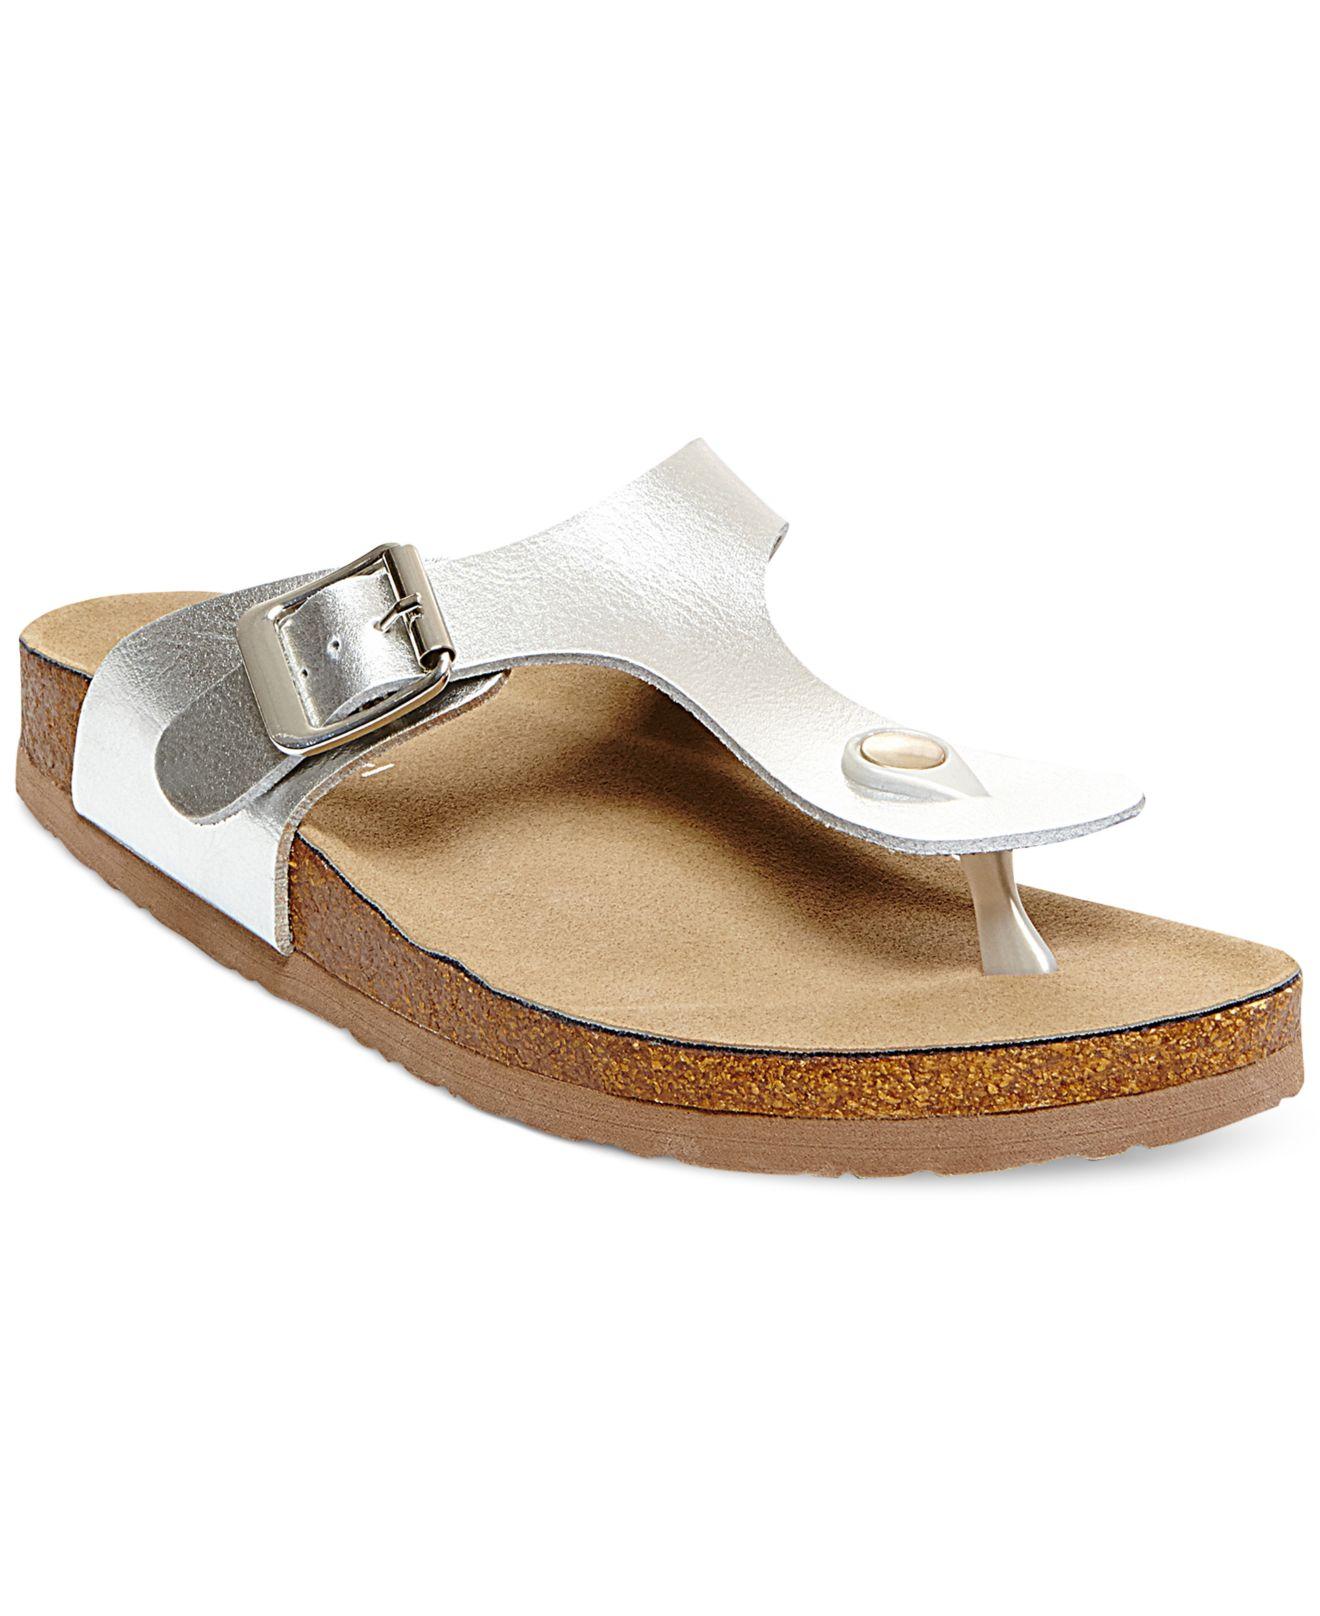 4f9dcb7b1726b Lyst - Madden Girl Boise Footbed Thong Sandals in Metallic